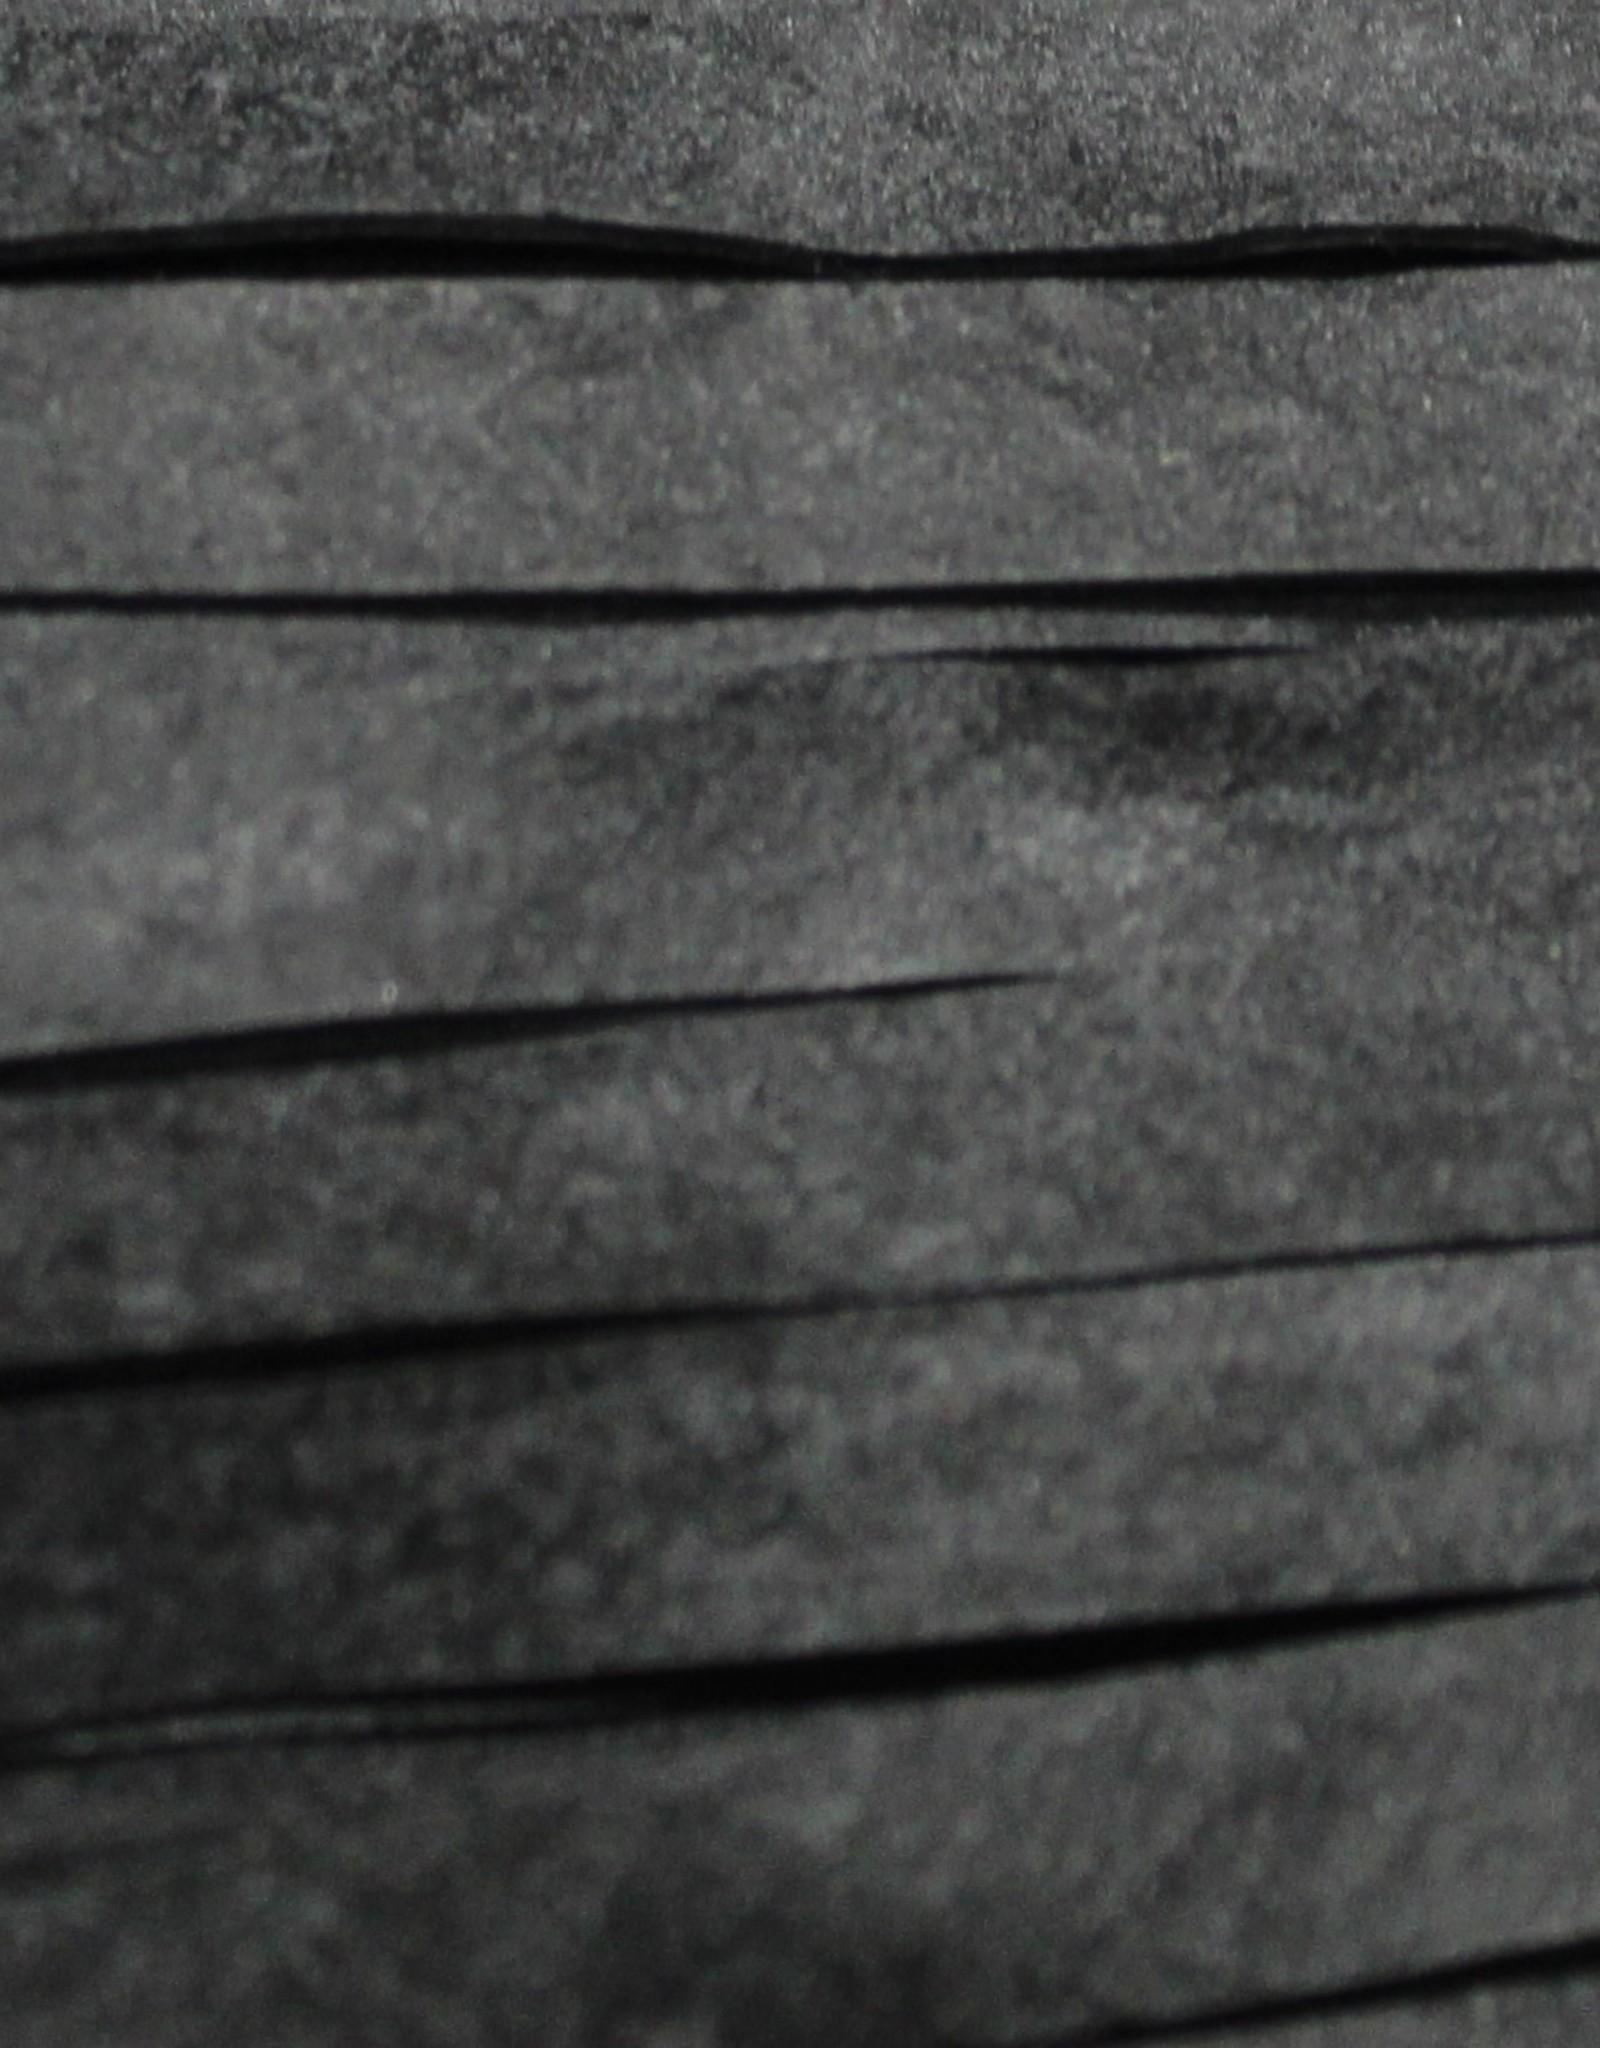 Badpak elastiek 6mm zwart